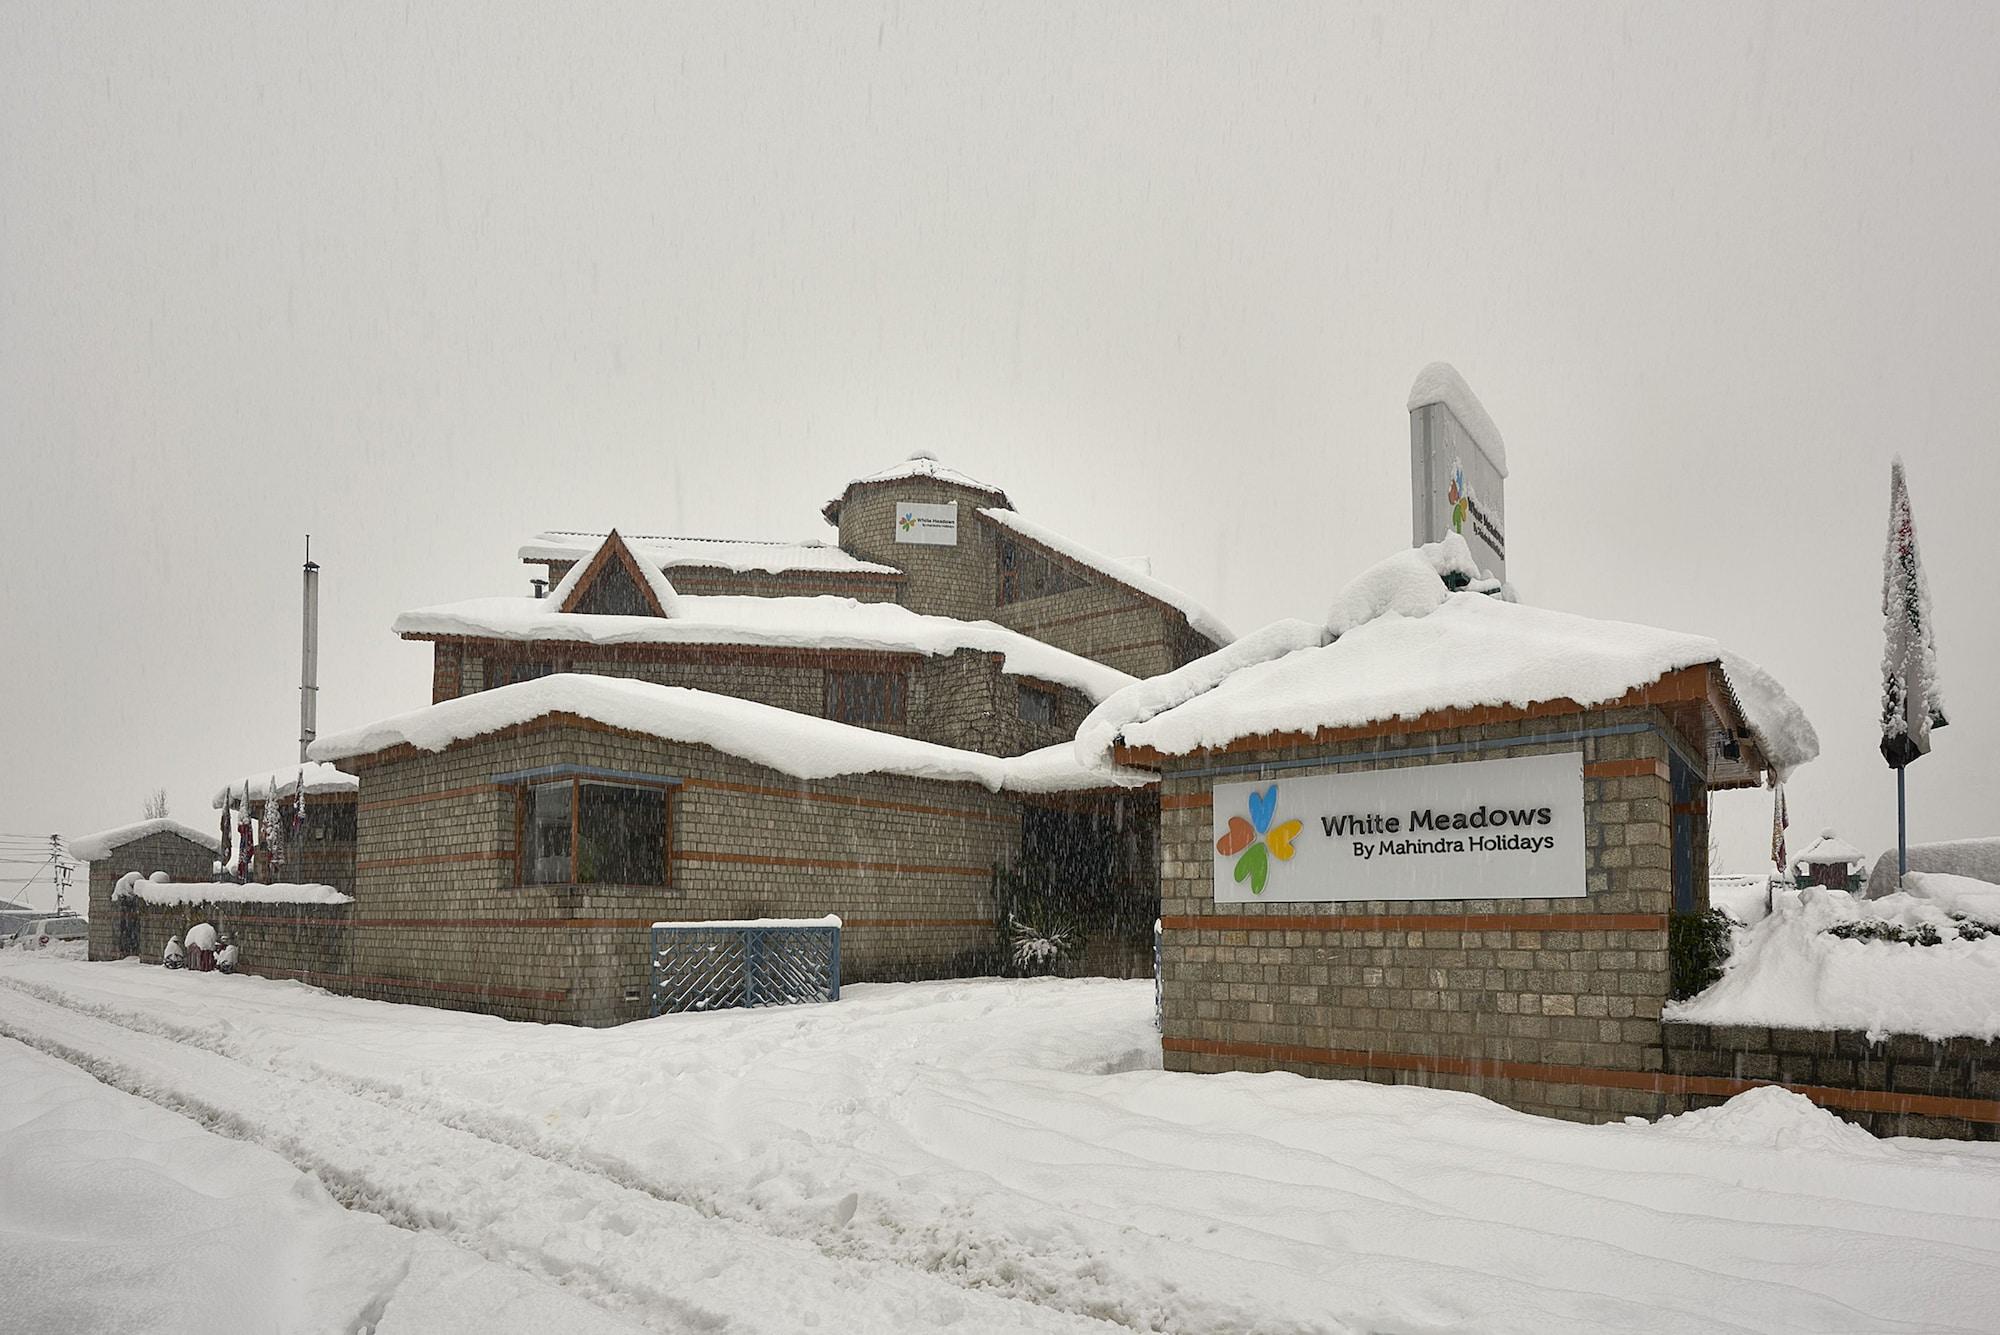 Club Mahindra White Meadows Manali, Kullu